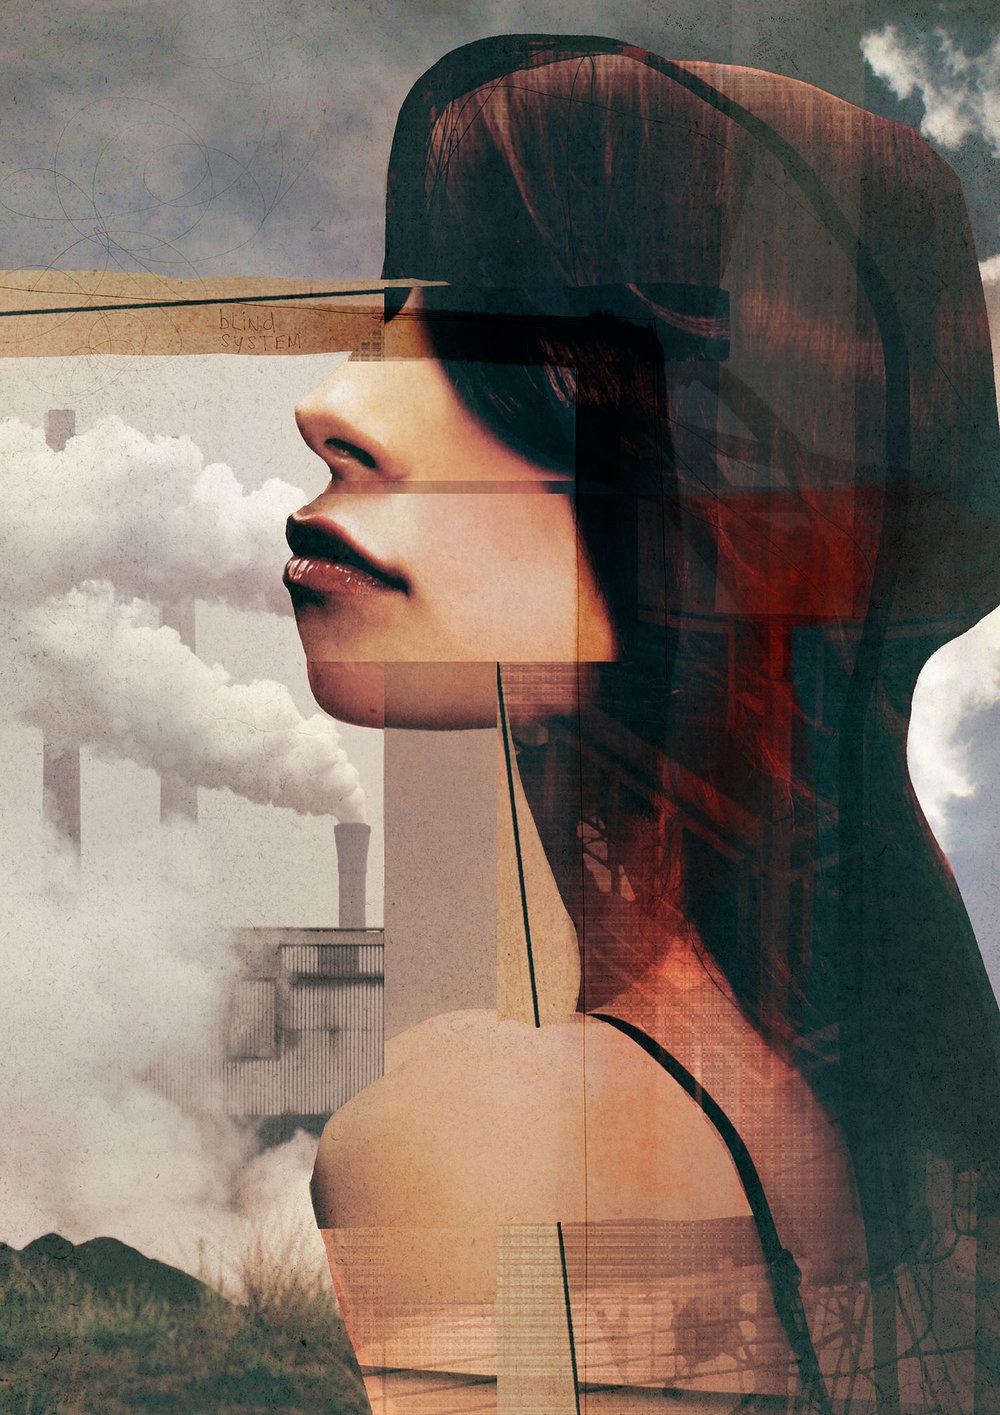 Blind System , digital collage by Sander Steins (The Netherlands) - Exclusive to Statement Art